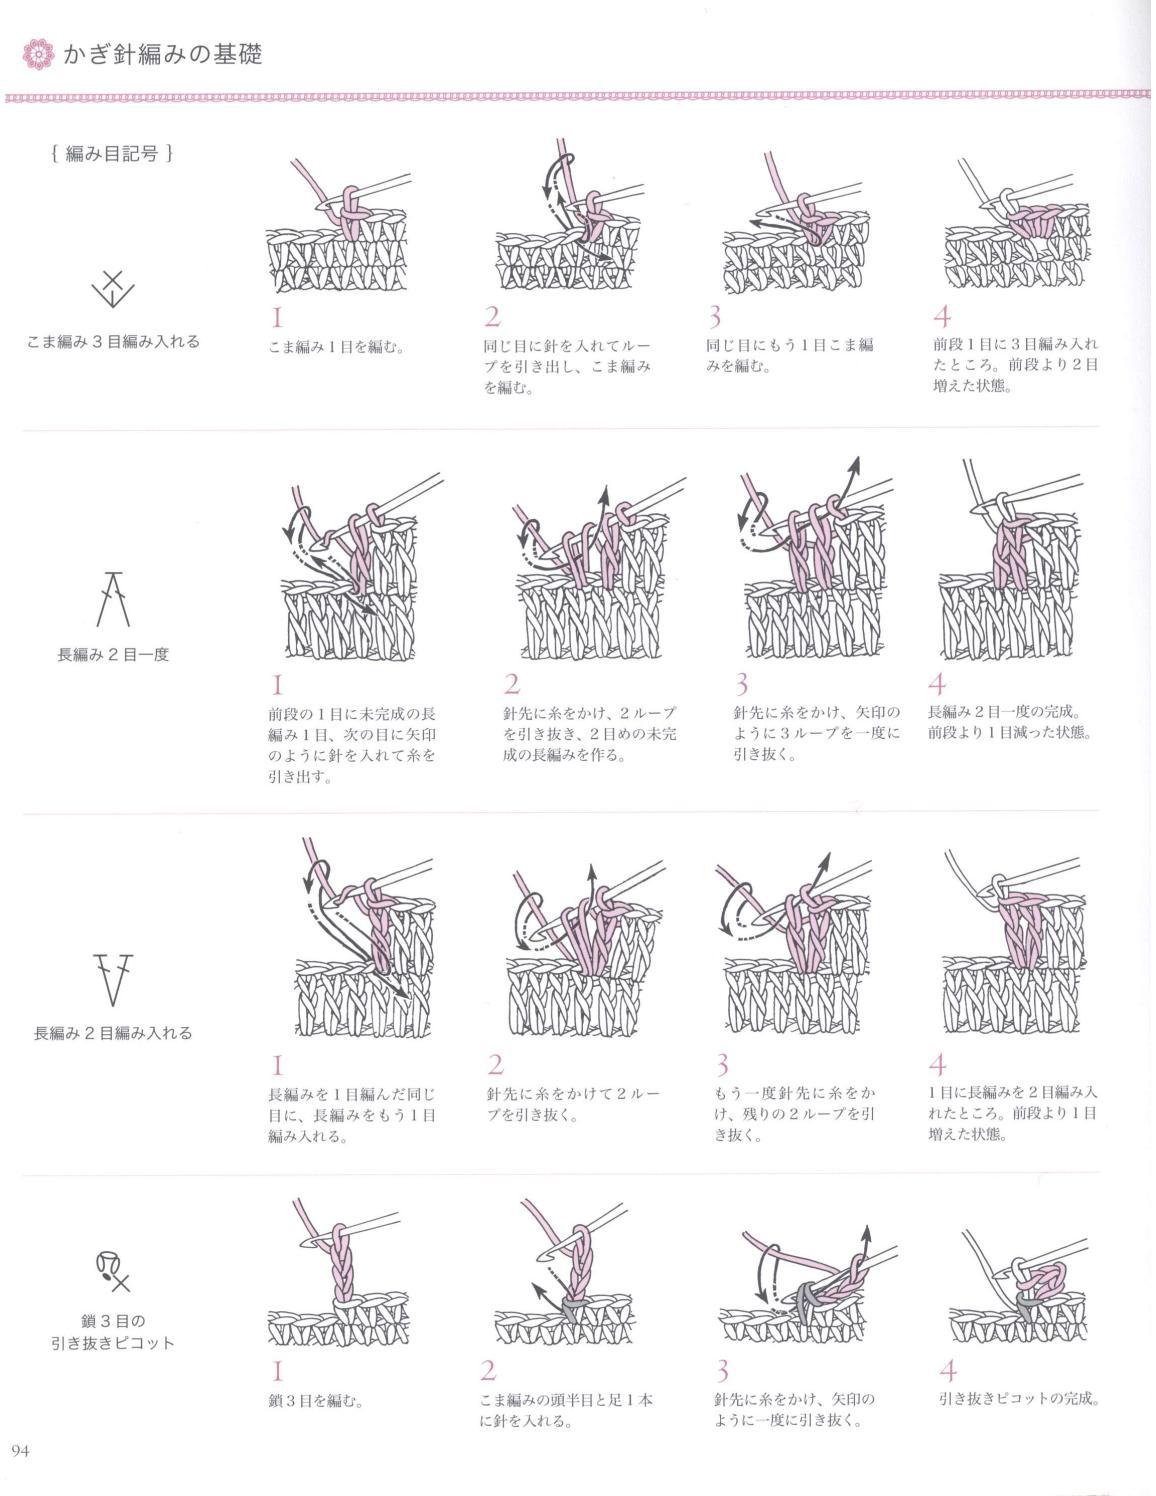 Asahi original crochet best selection 2012 page 94